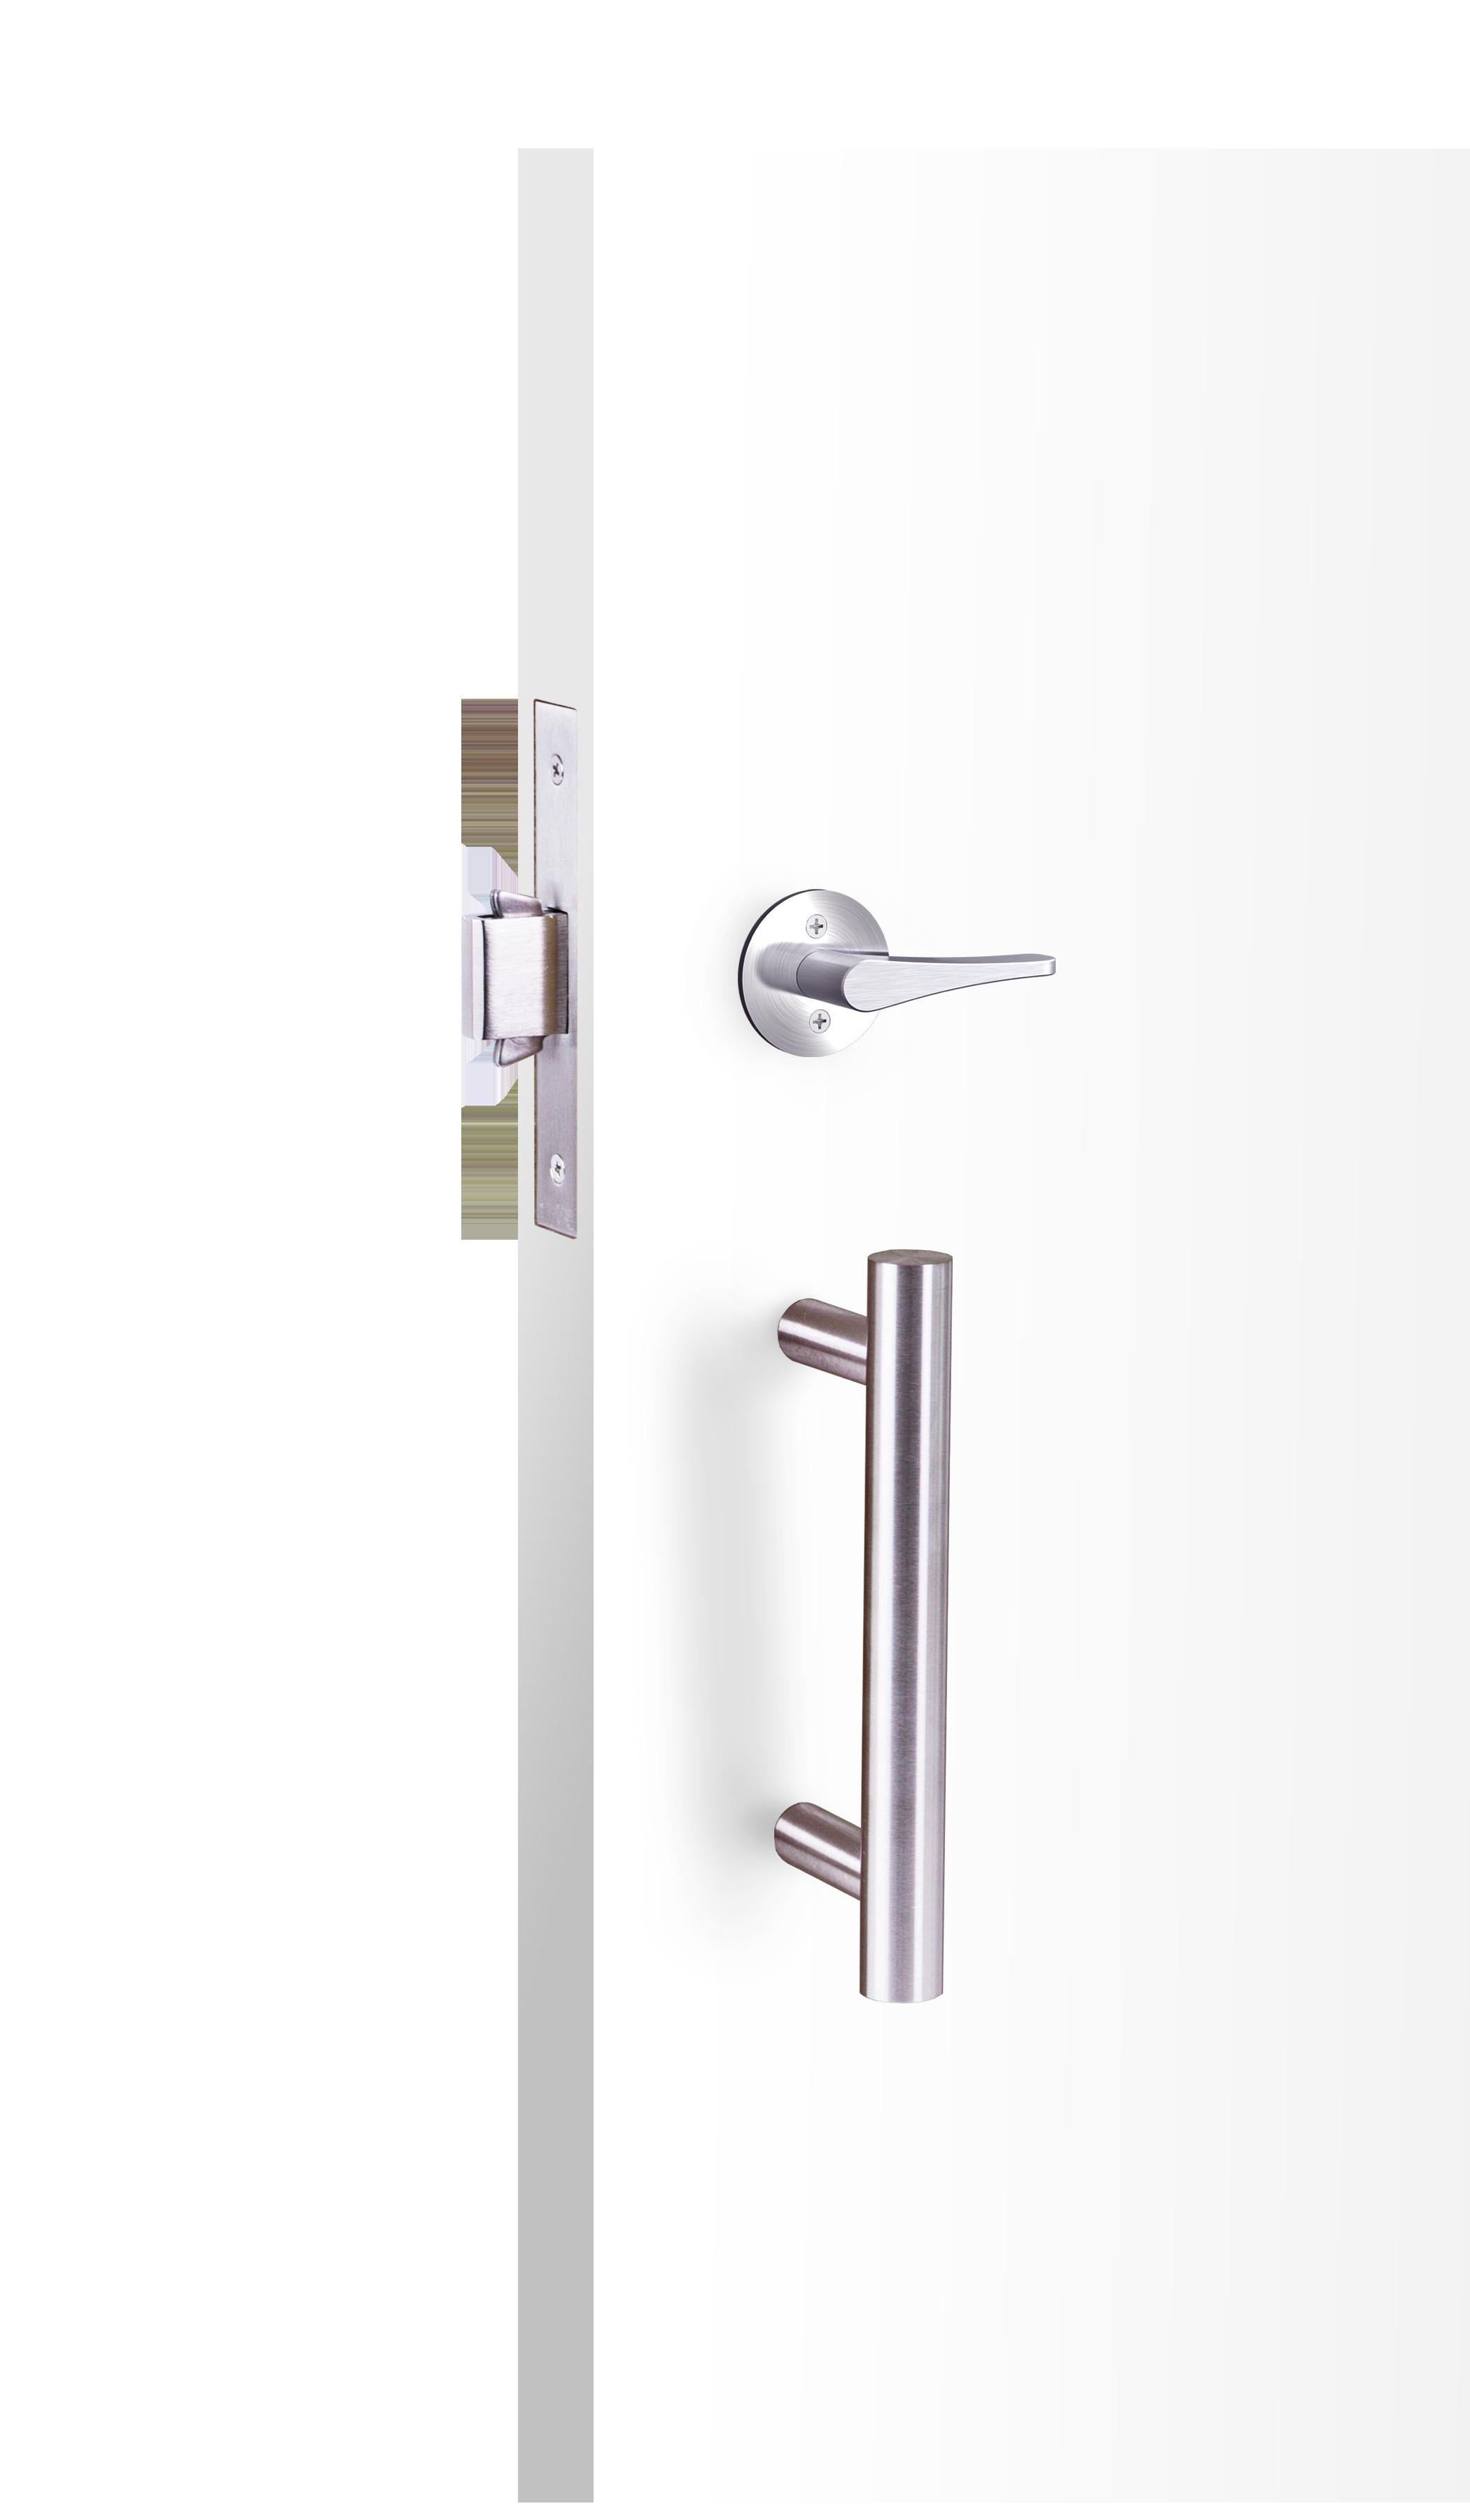 2001adap Sliding Door Hardware Sets Acclock